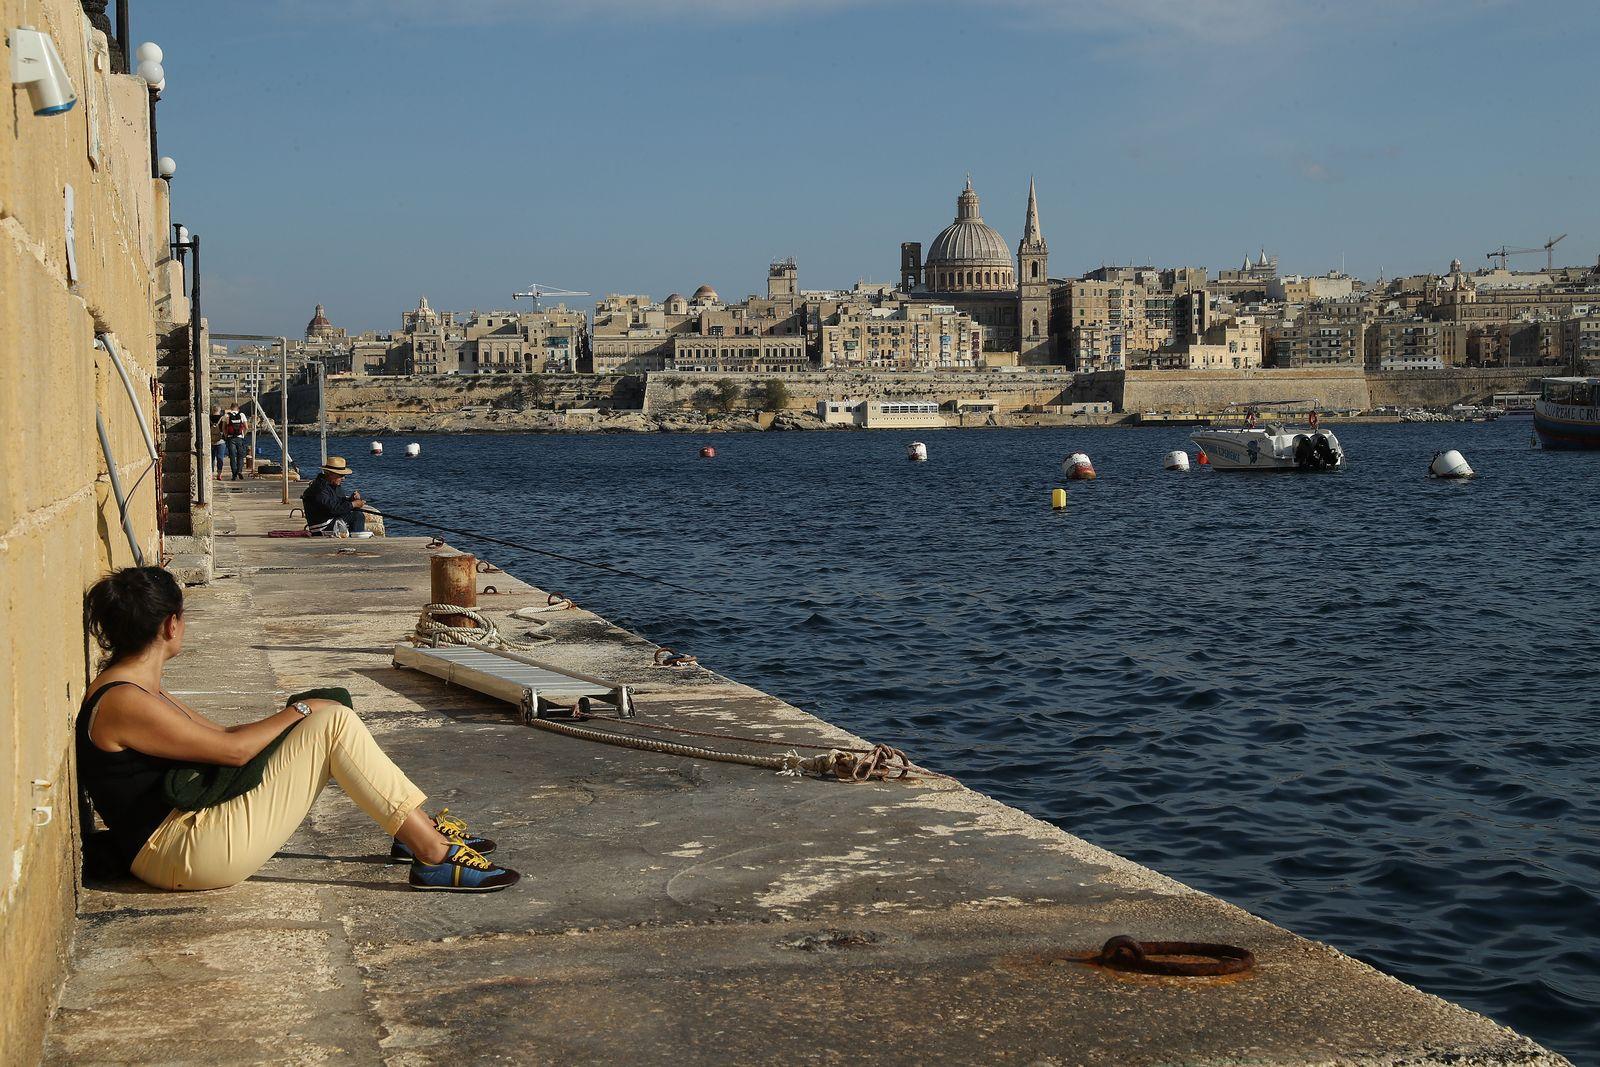 Travel Destination: Malta